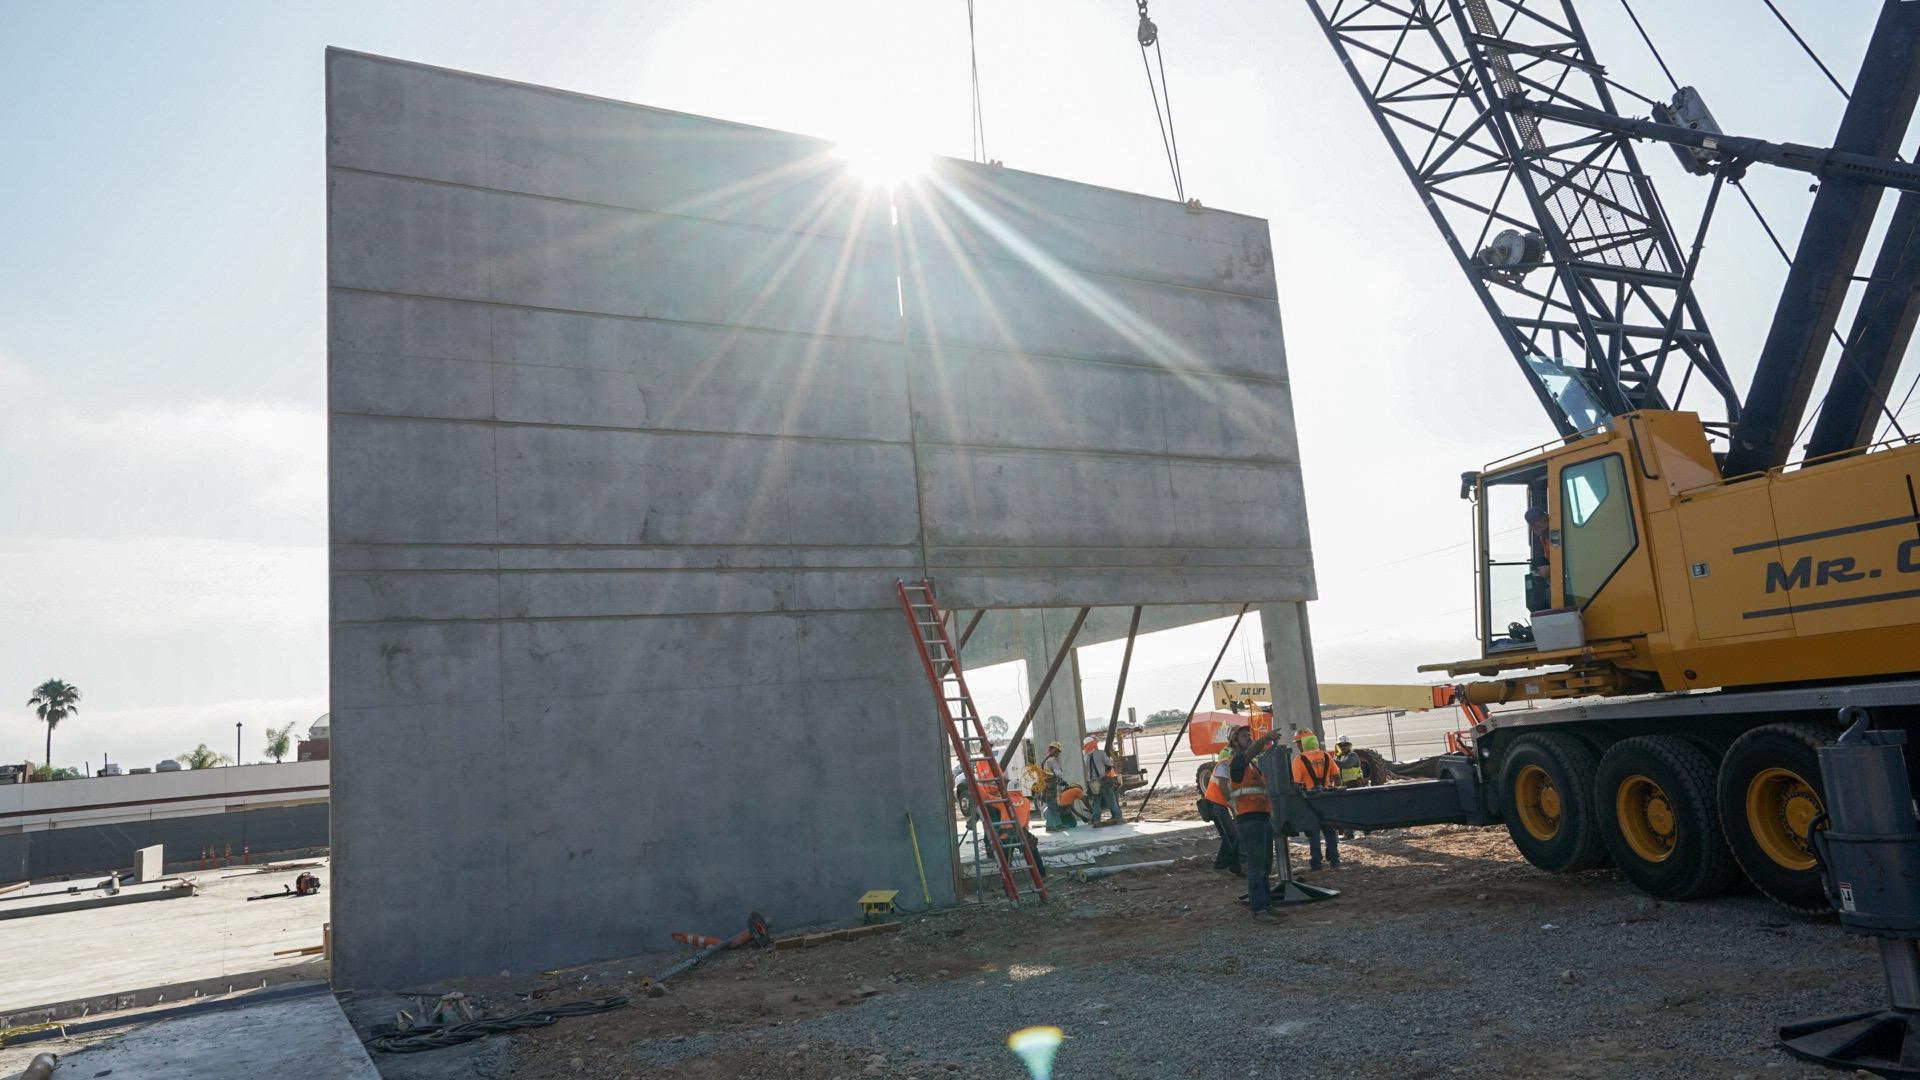 K.D. Stahl Construction Group Inc. - Bedrosian Tile & Stone Ground up New Construction